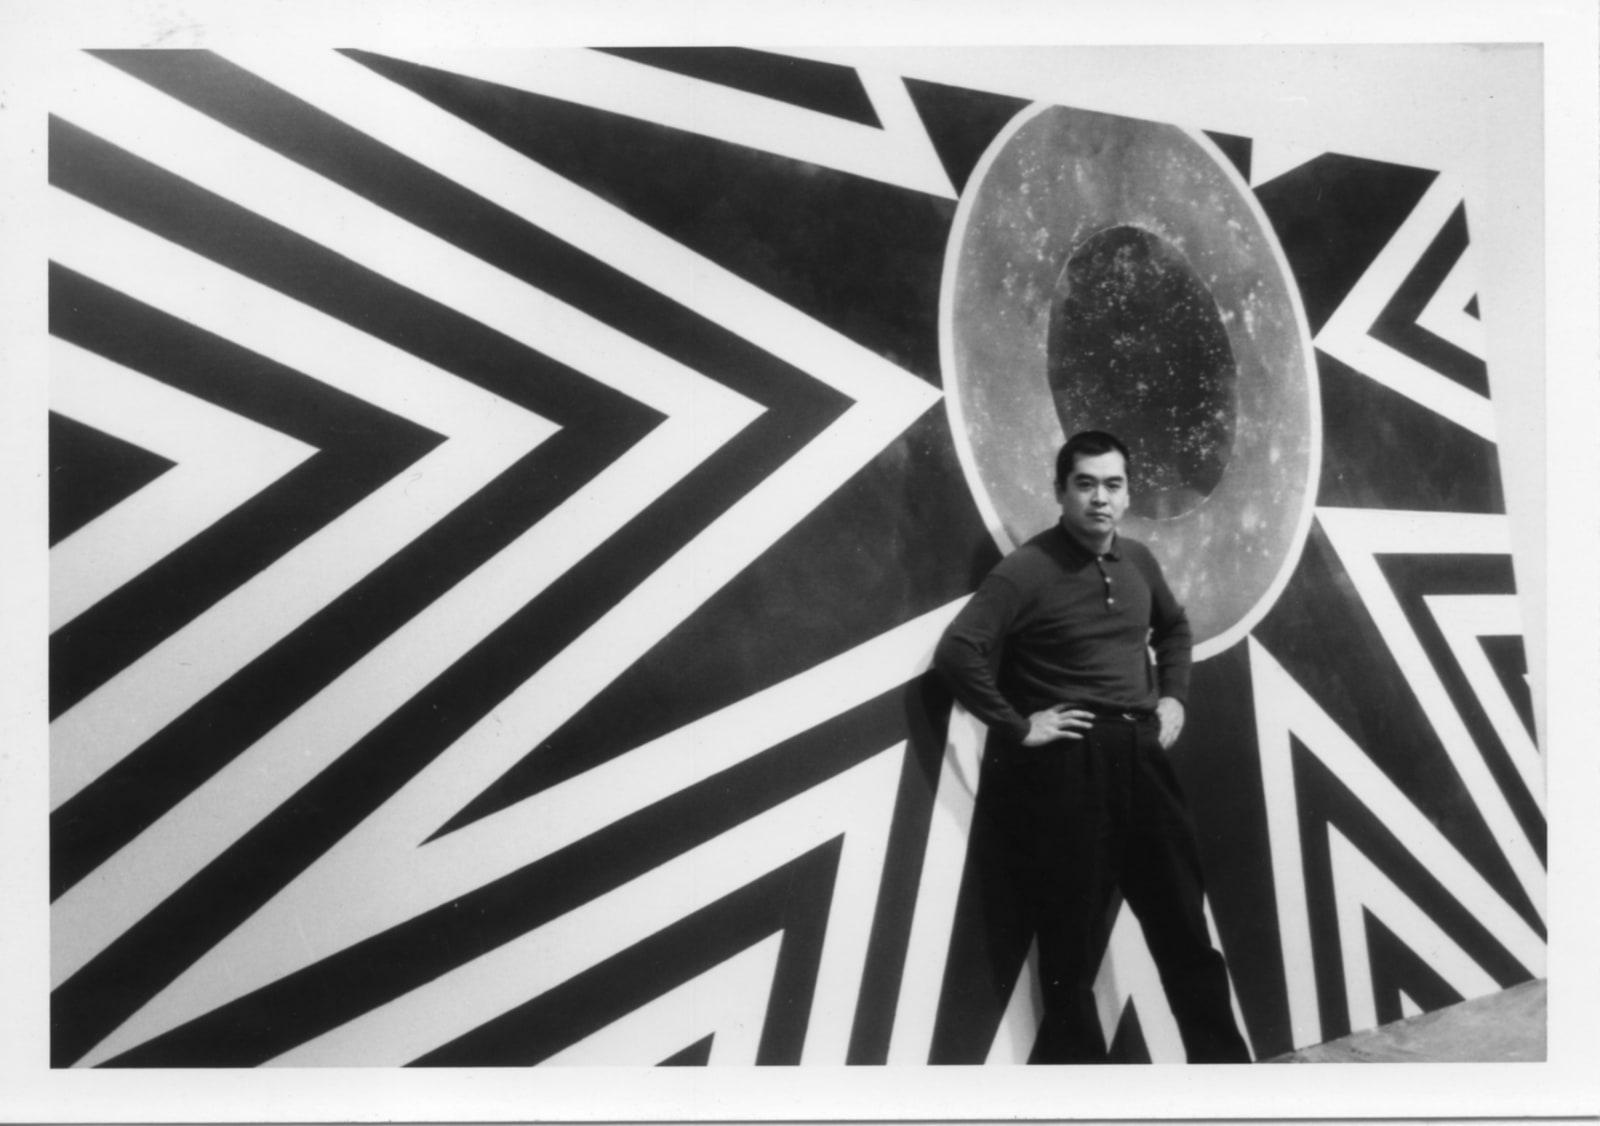 1965, Hsiao Chin in London 1965年蕭勤攝於倫敦